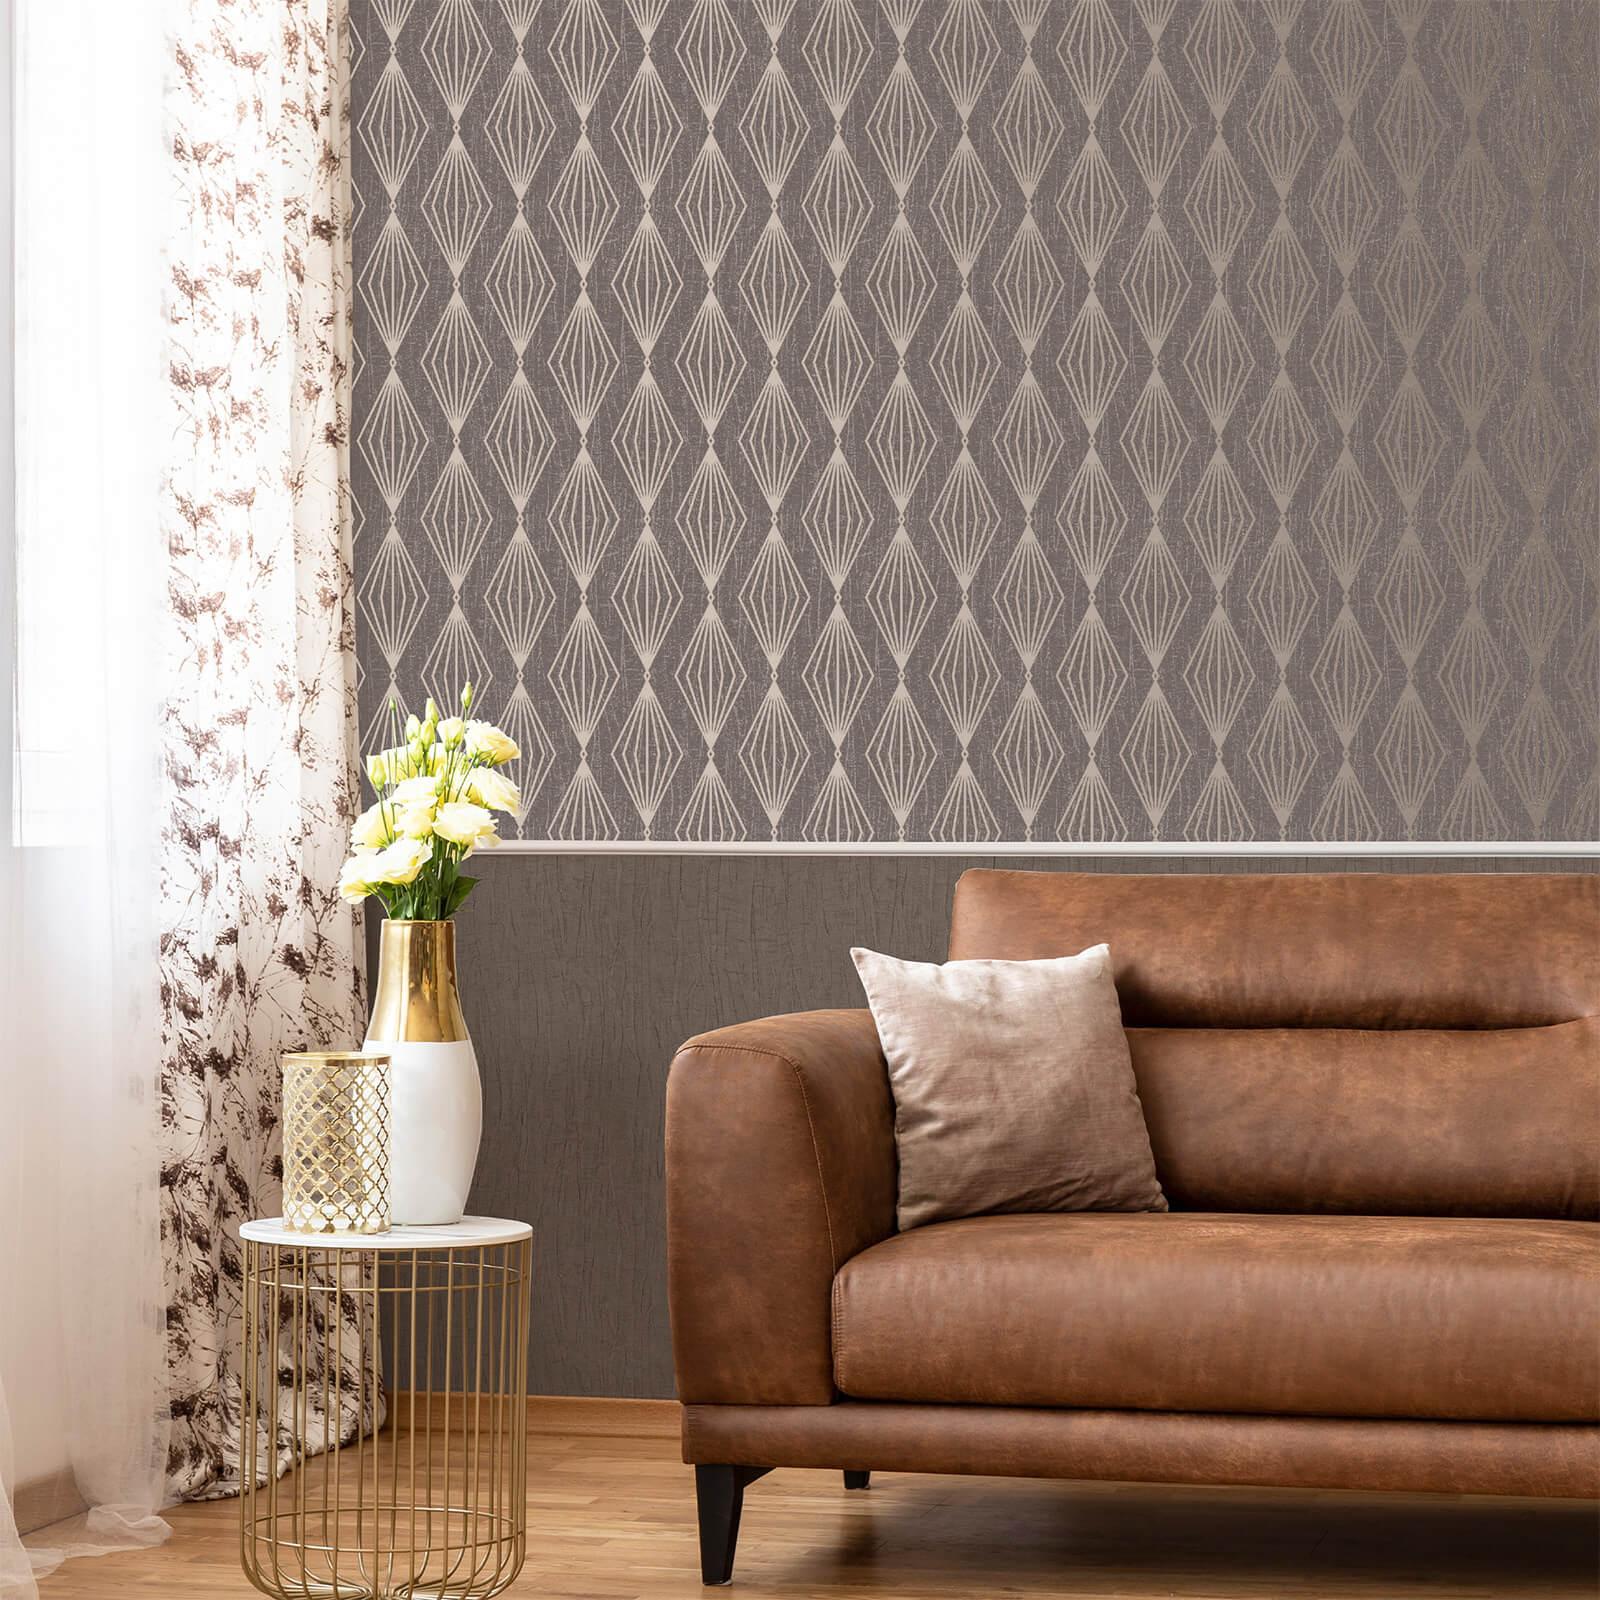 Boutique Smokey Quartz Marquise Geometric Wallpaper-